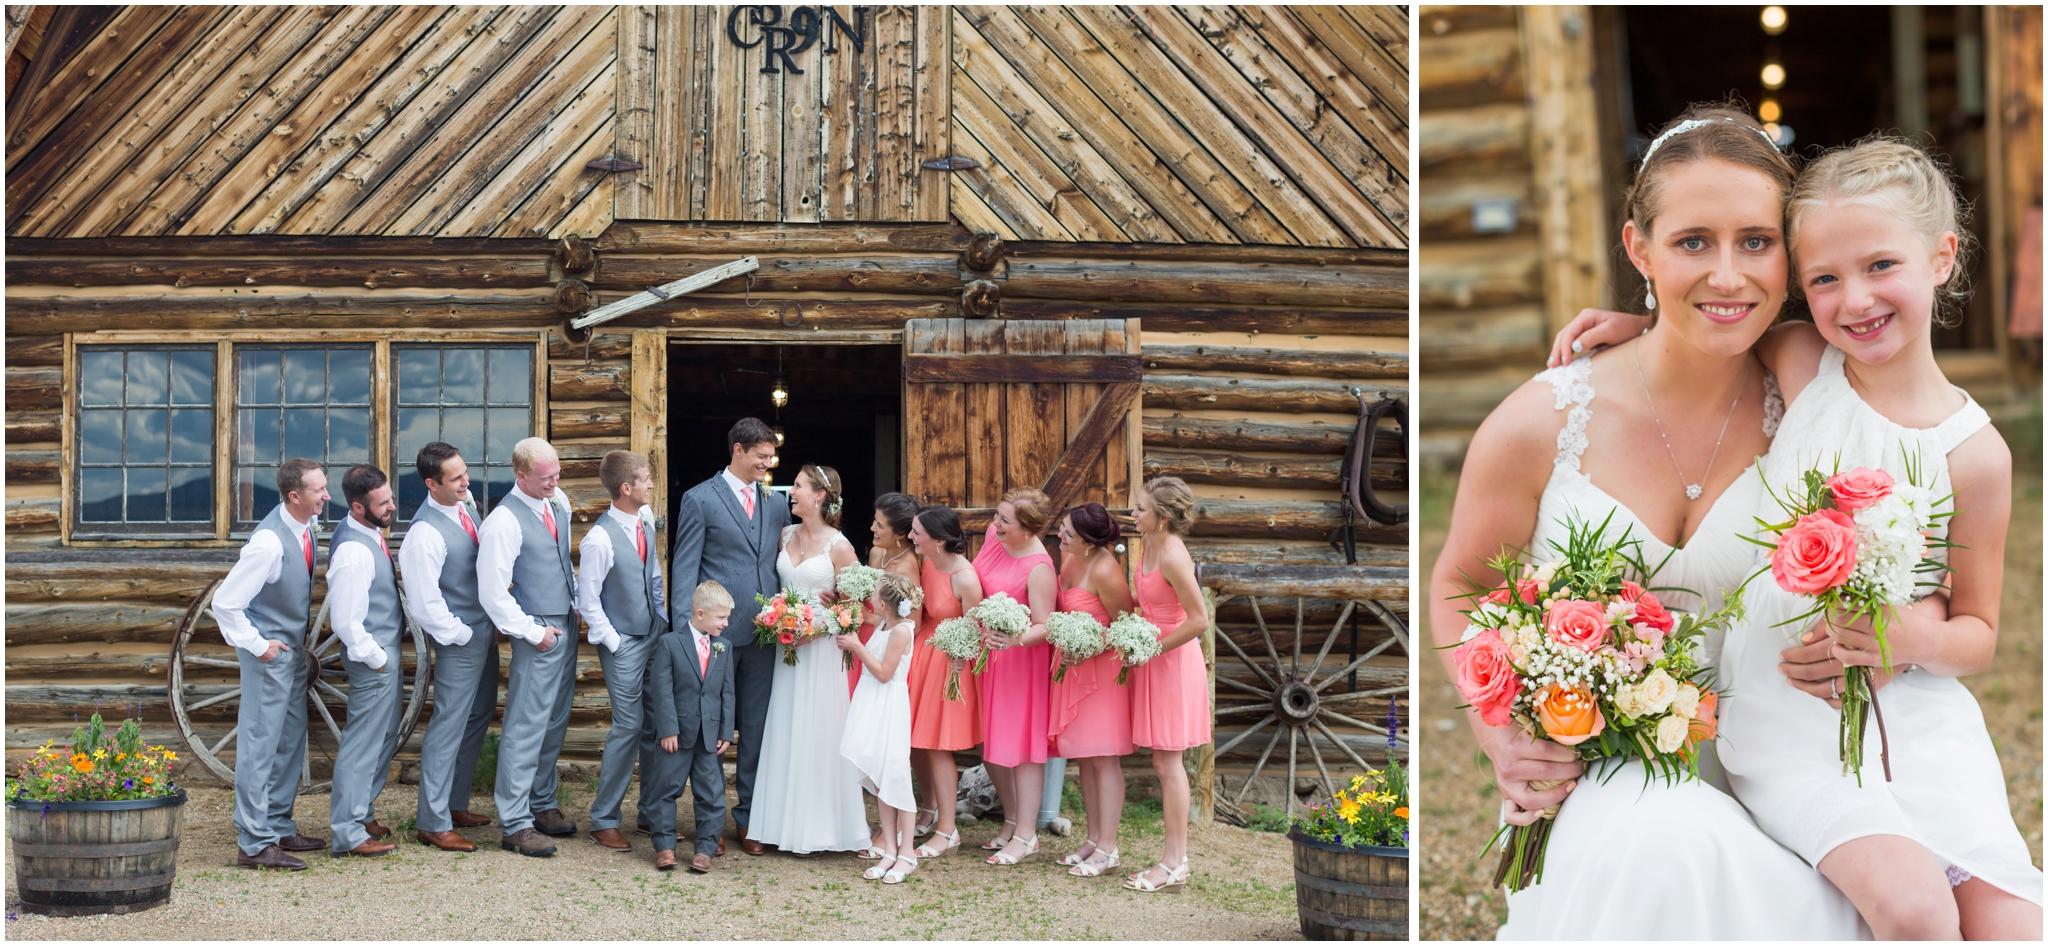 Strawberry_Creek_Ranch_Wedding_Photographer13.jpg